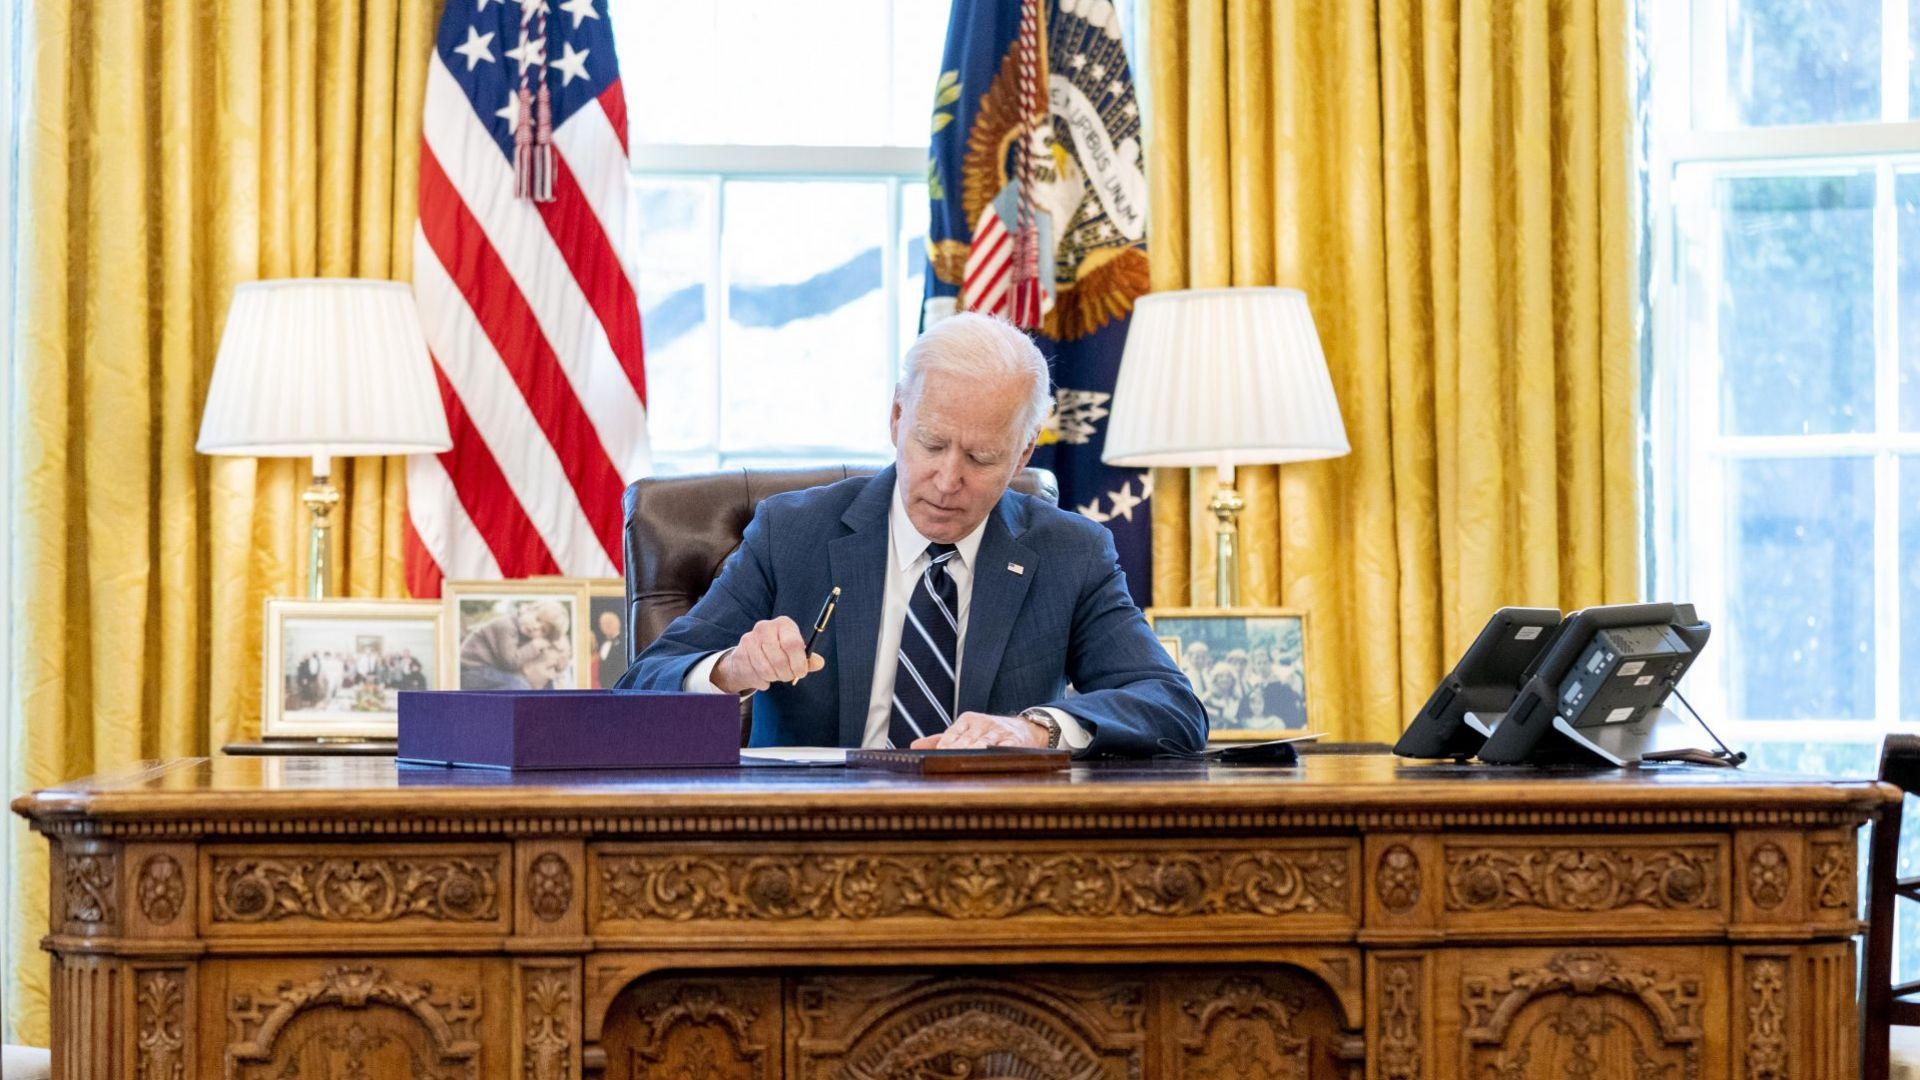 Байдън подписа икономическия мегапакет за 1,9 трилиона долара